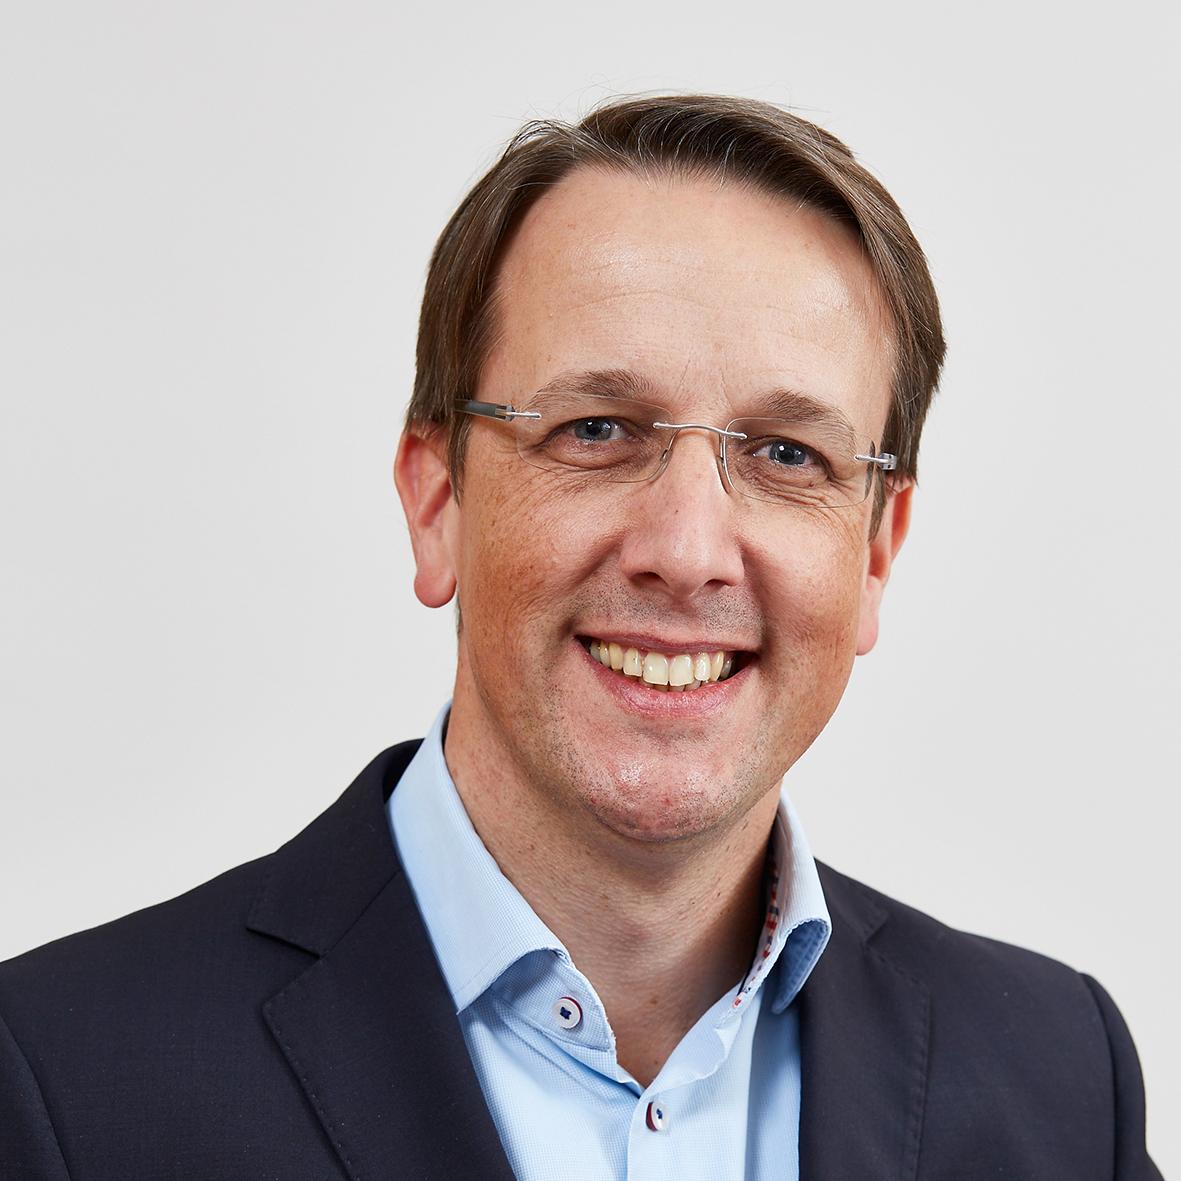 Jochen Krisch